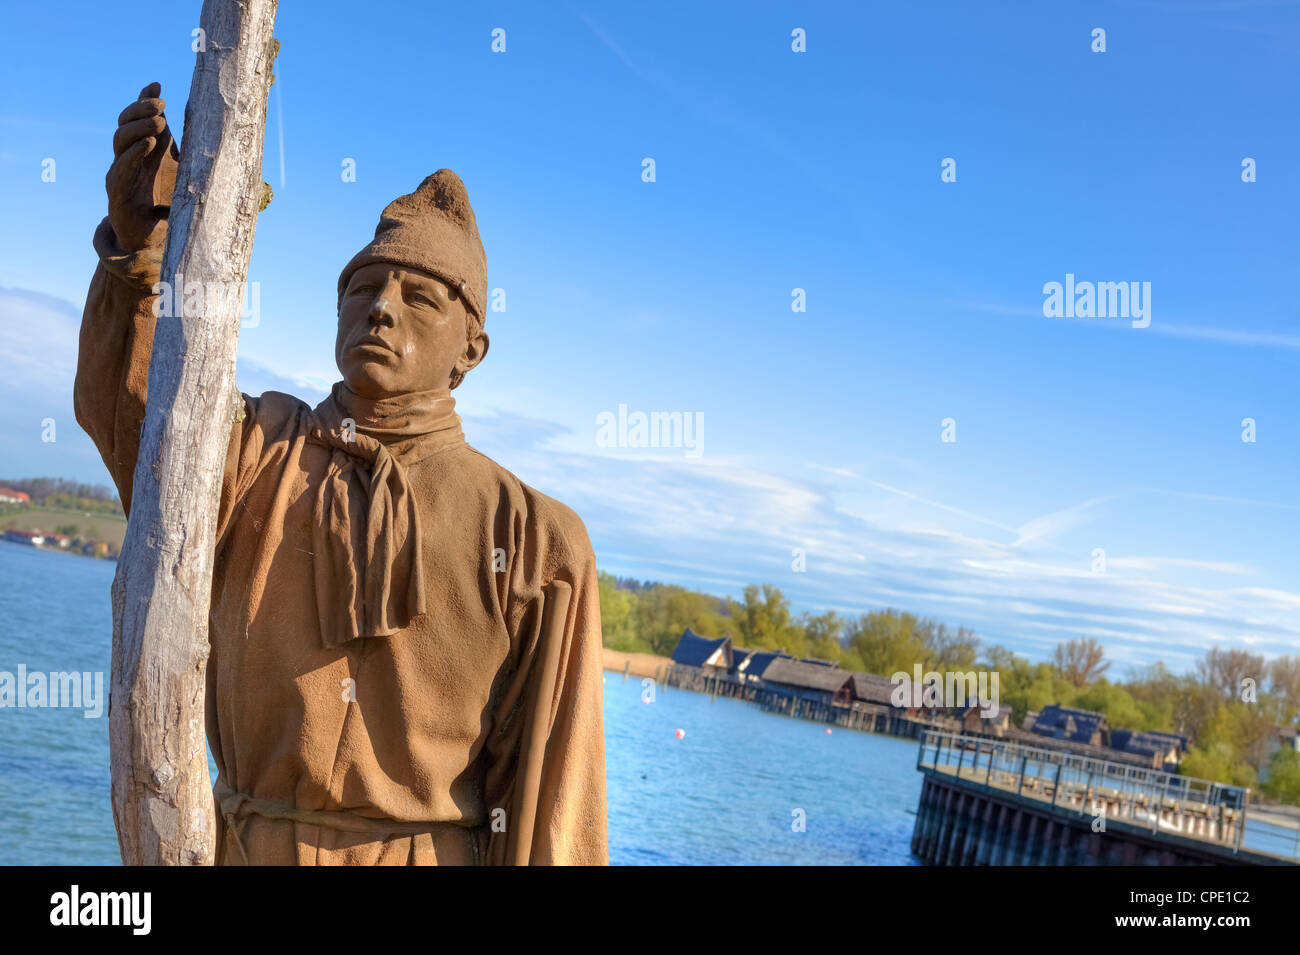 Sculpture of a pile maker in Unteruhldingen pier, stilt houses in the background, Baden-Wurttemberg, Lake Constance, - Stock Image